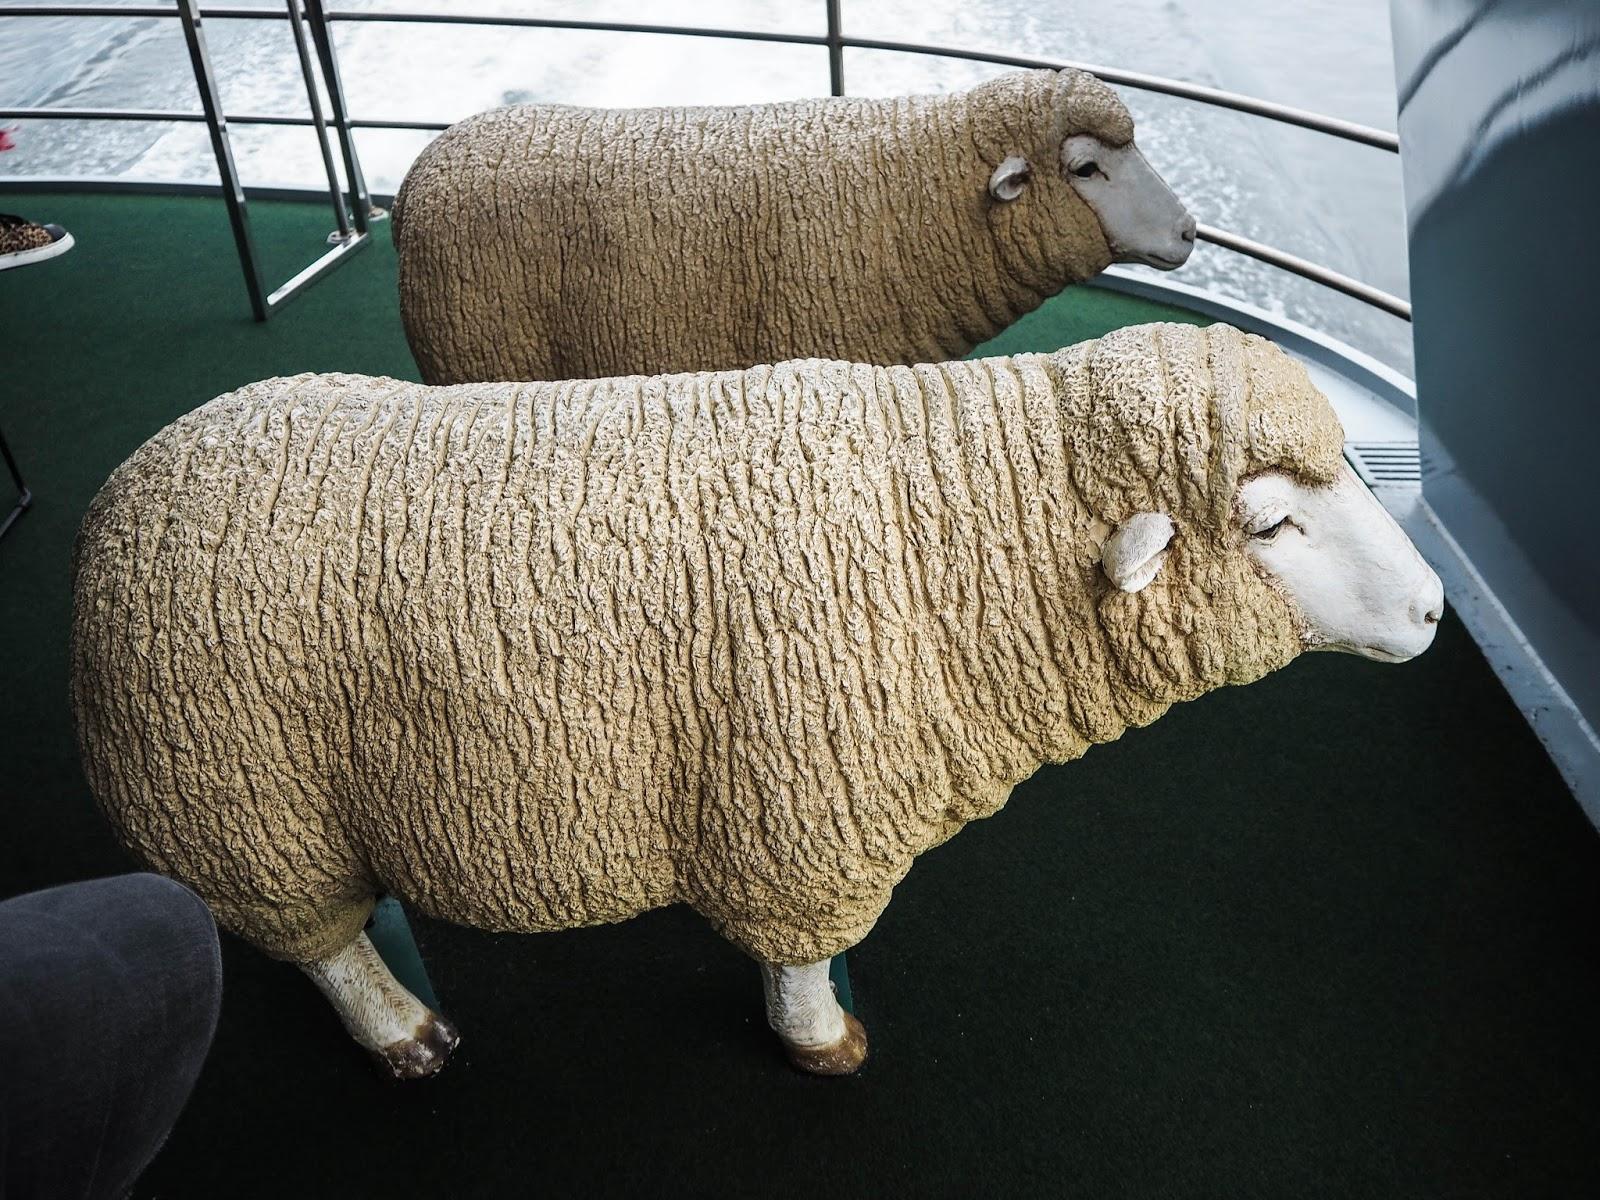 Sheep seats on the boat to MONA gallery, Tasmania